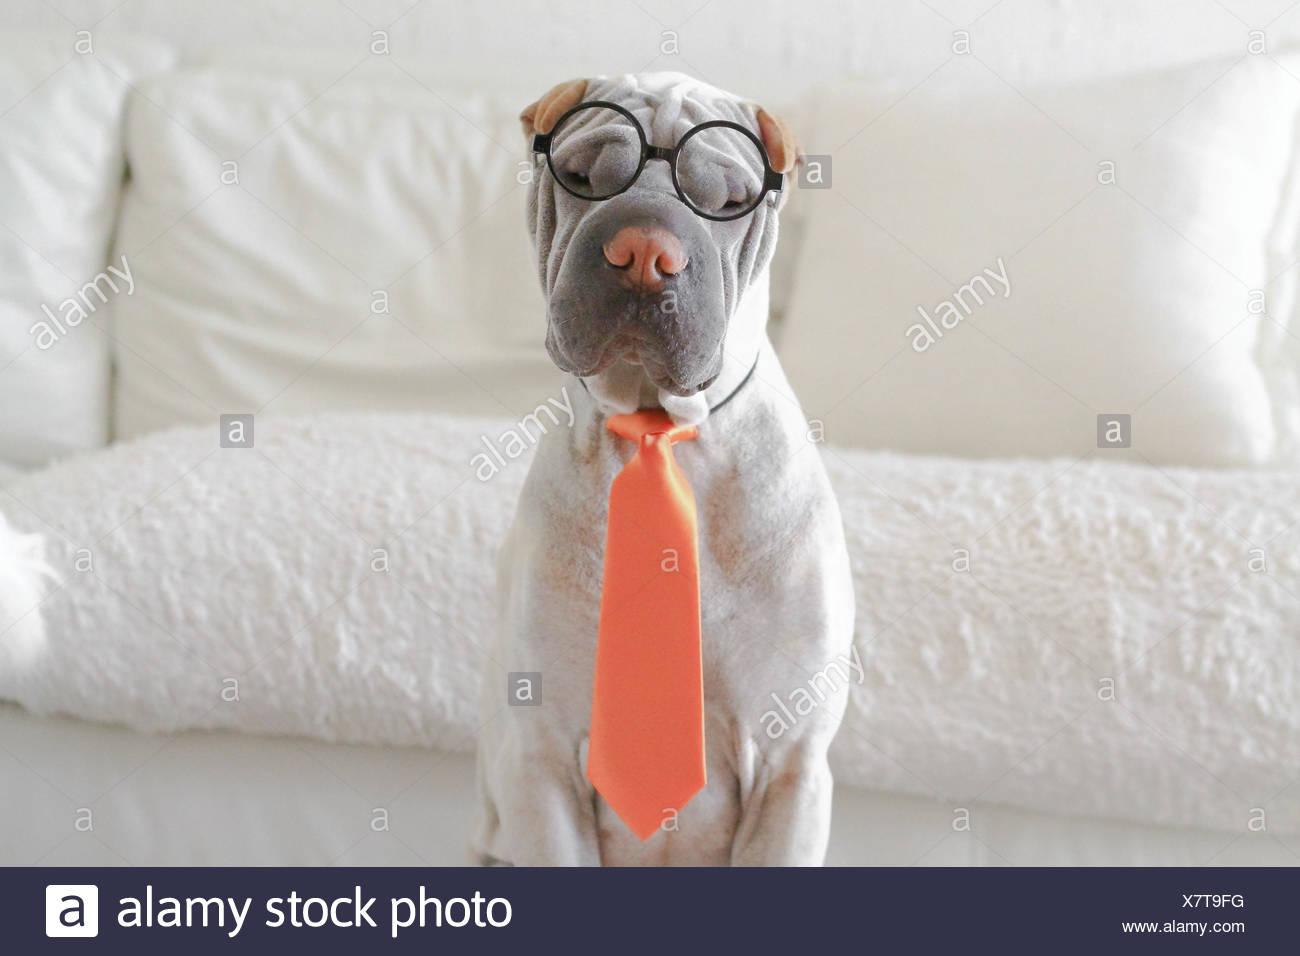 Shar-pei dressed as business man - Stock Image